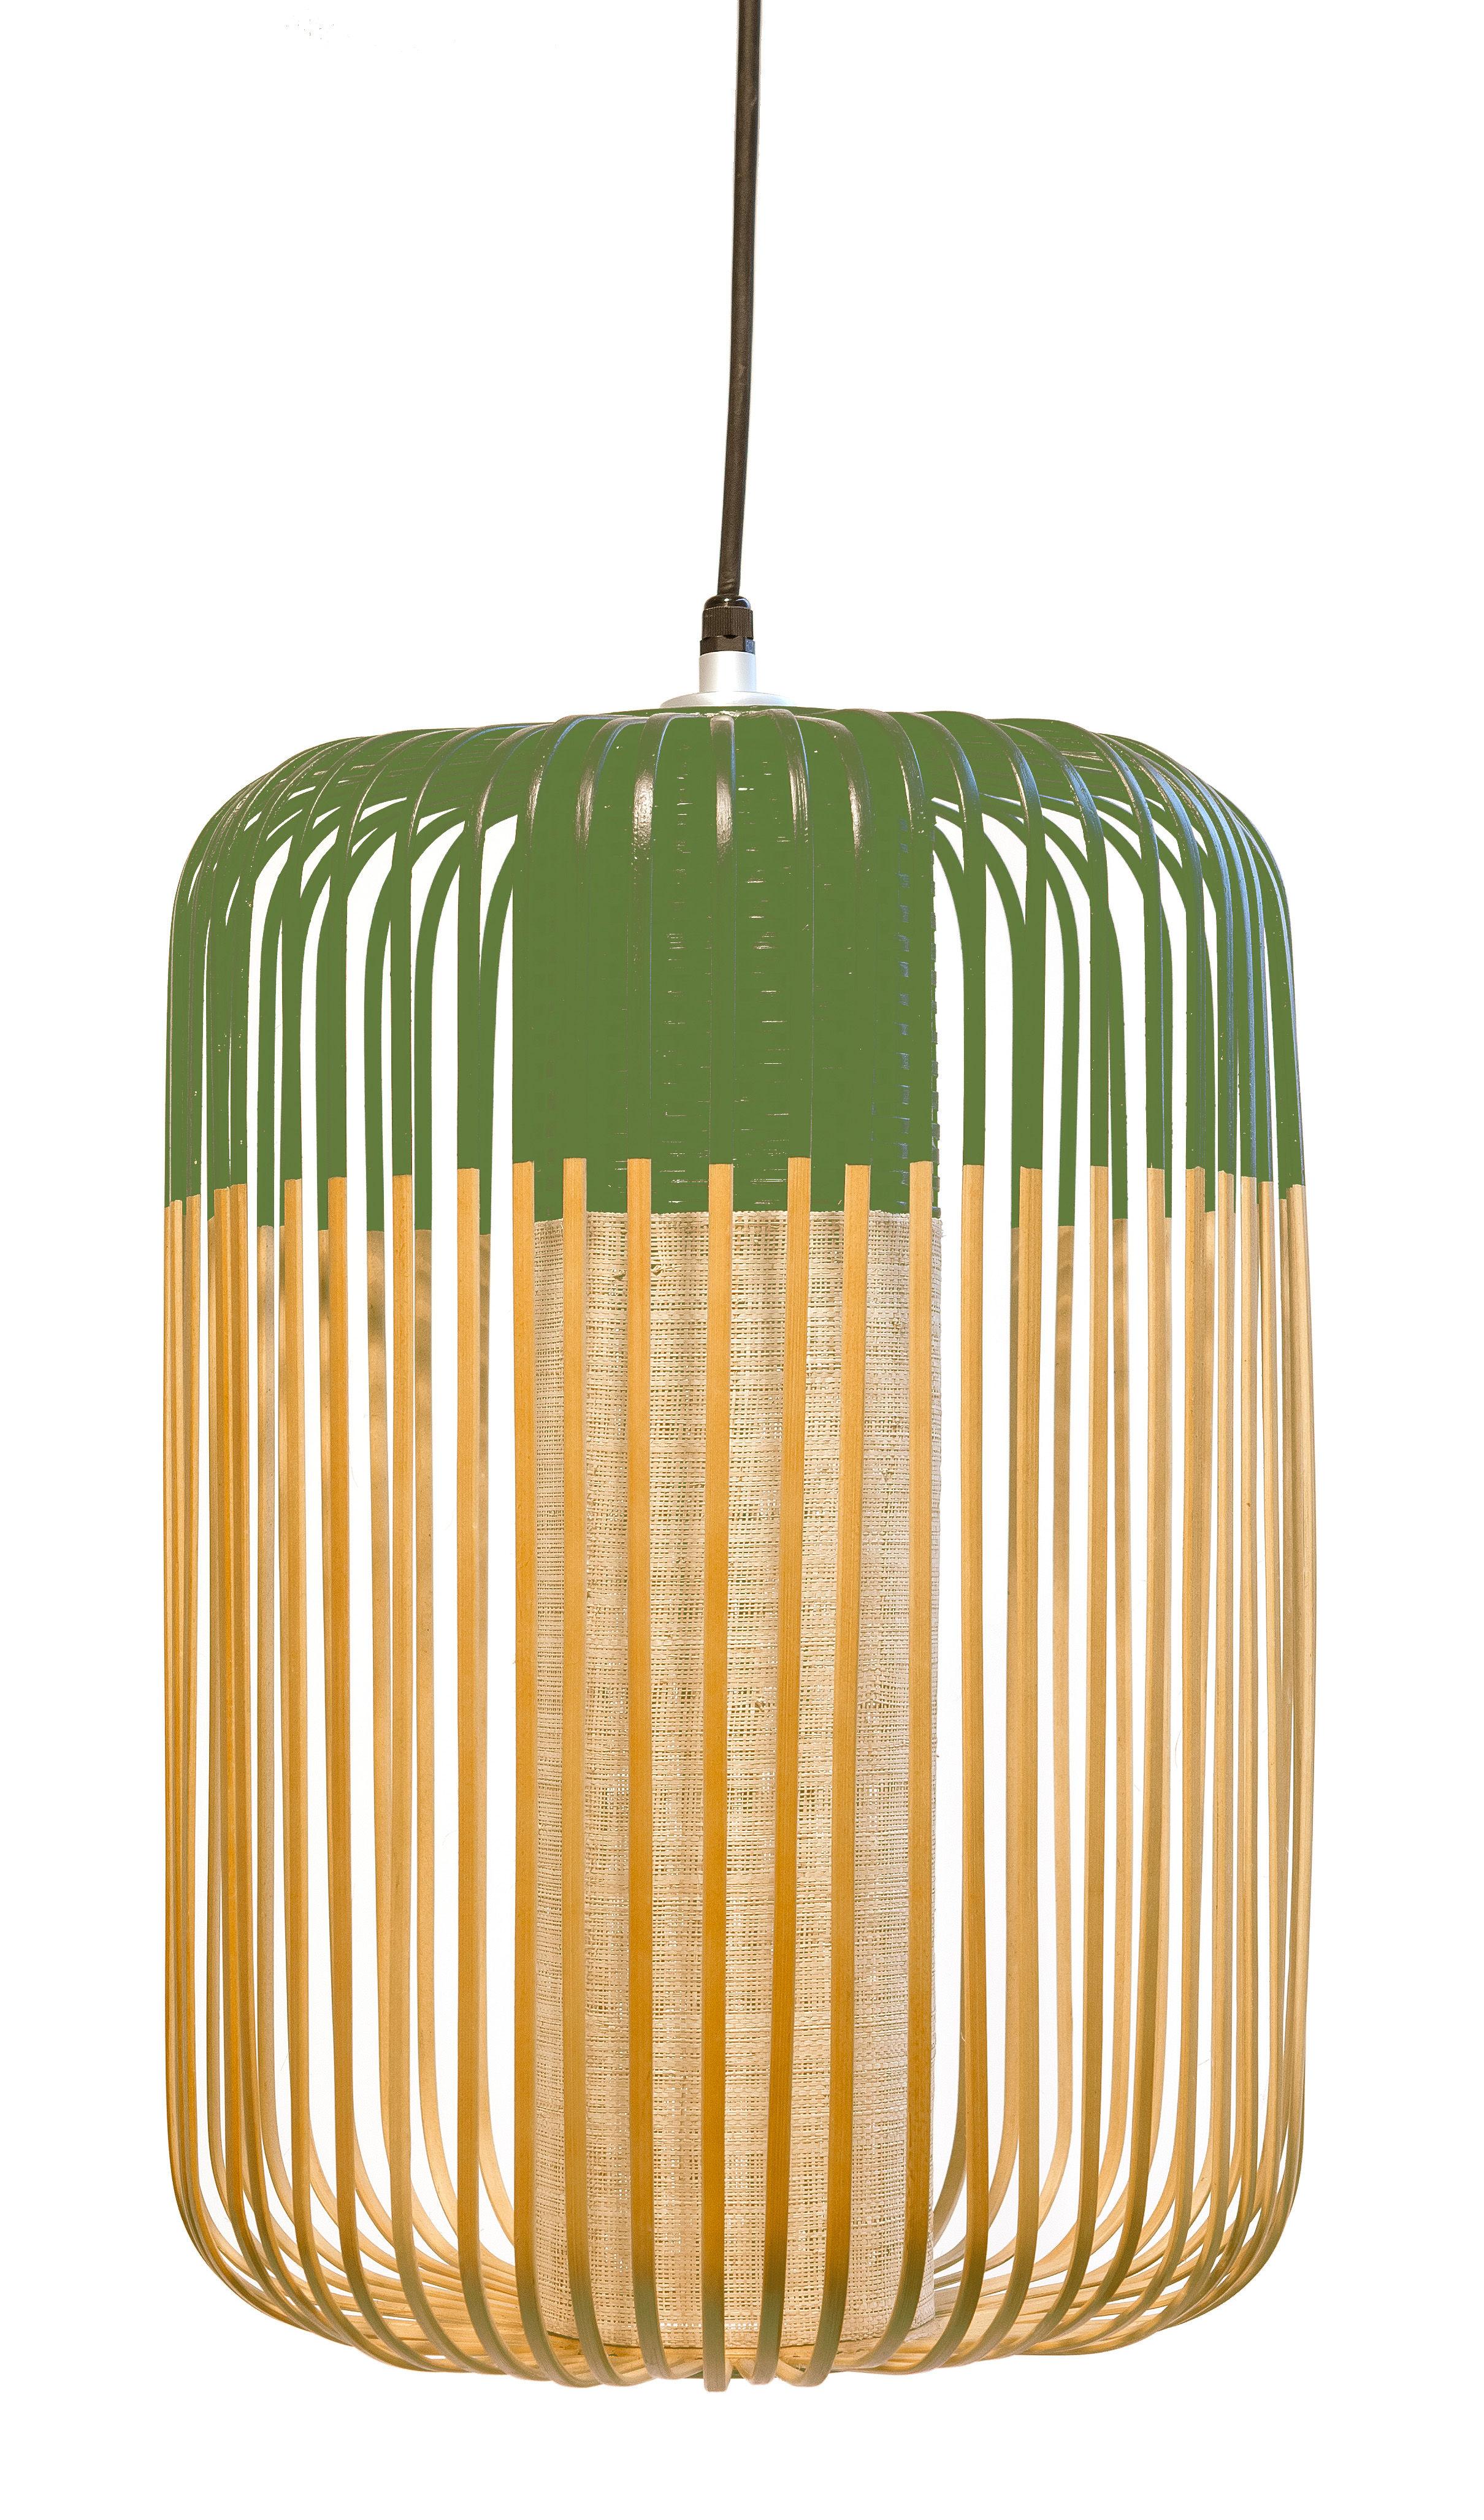 Illuminazione - Lampadari - Sospensione Bamboo Light L - / H 50 x Ø 35 cm di Forestier - Verde / Naturale - Bambù naturale, Metallo, Tessuto